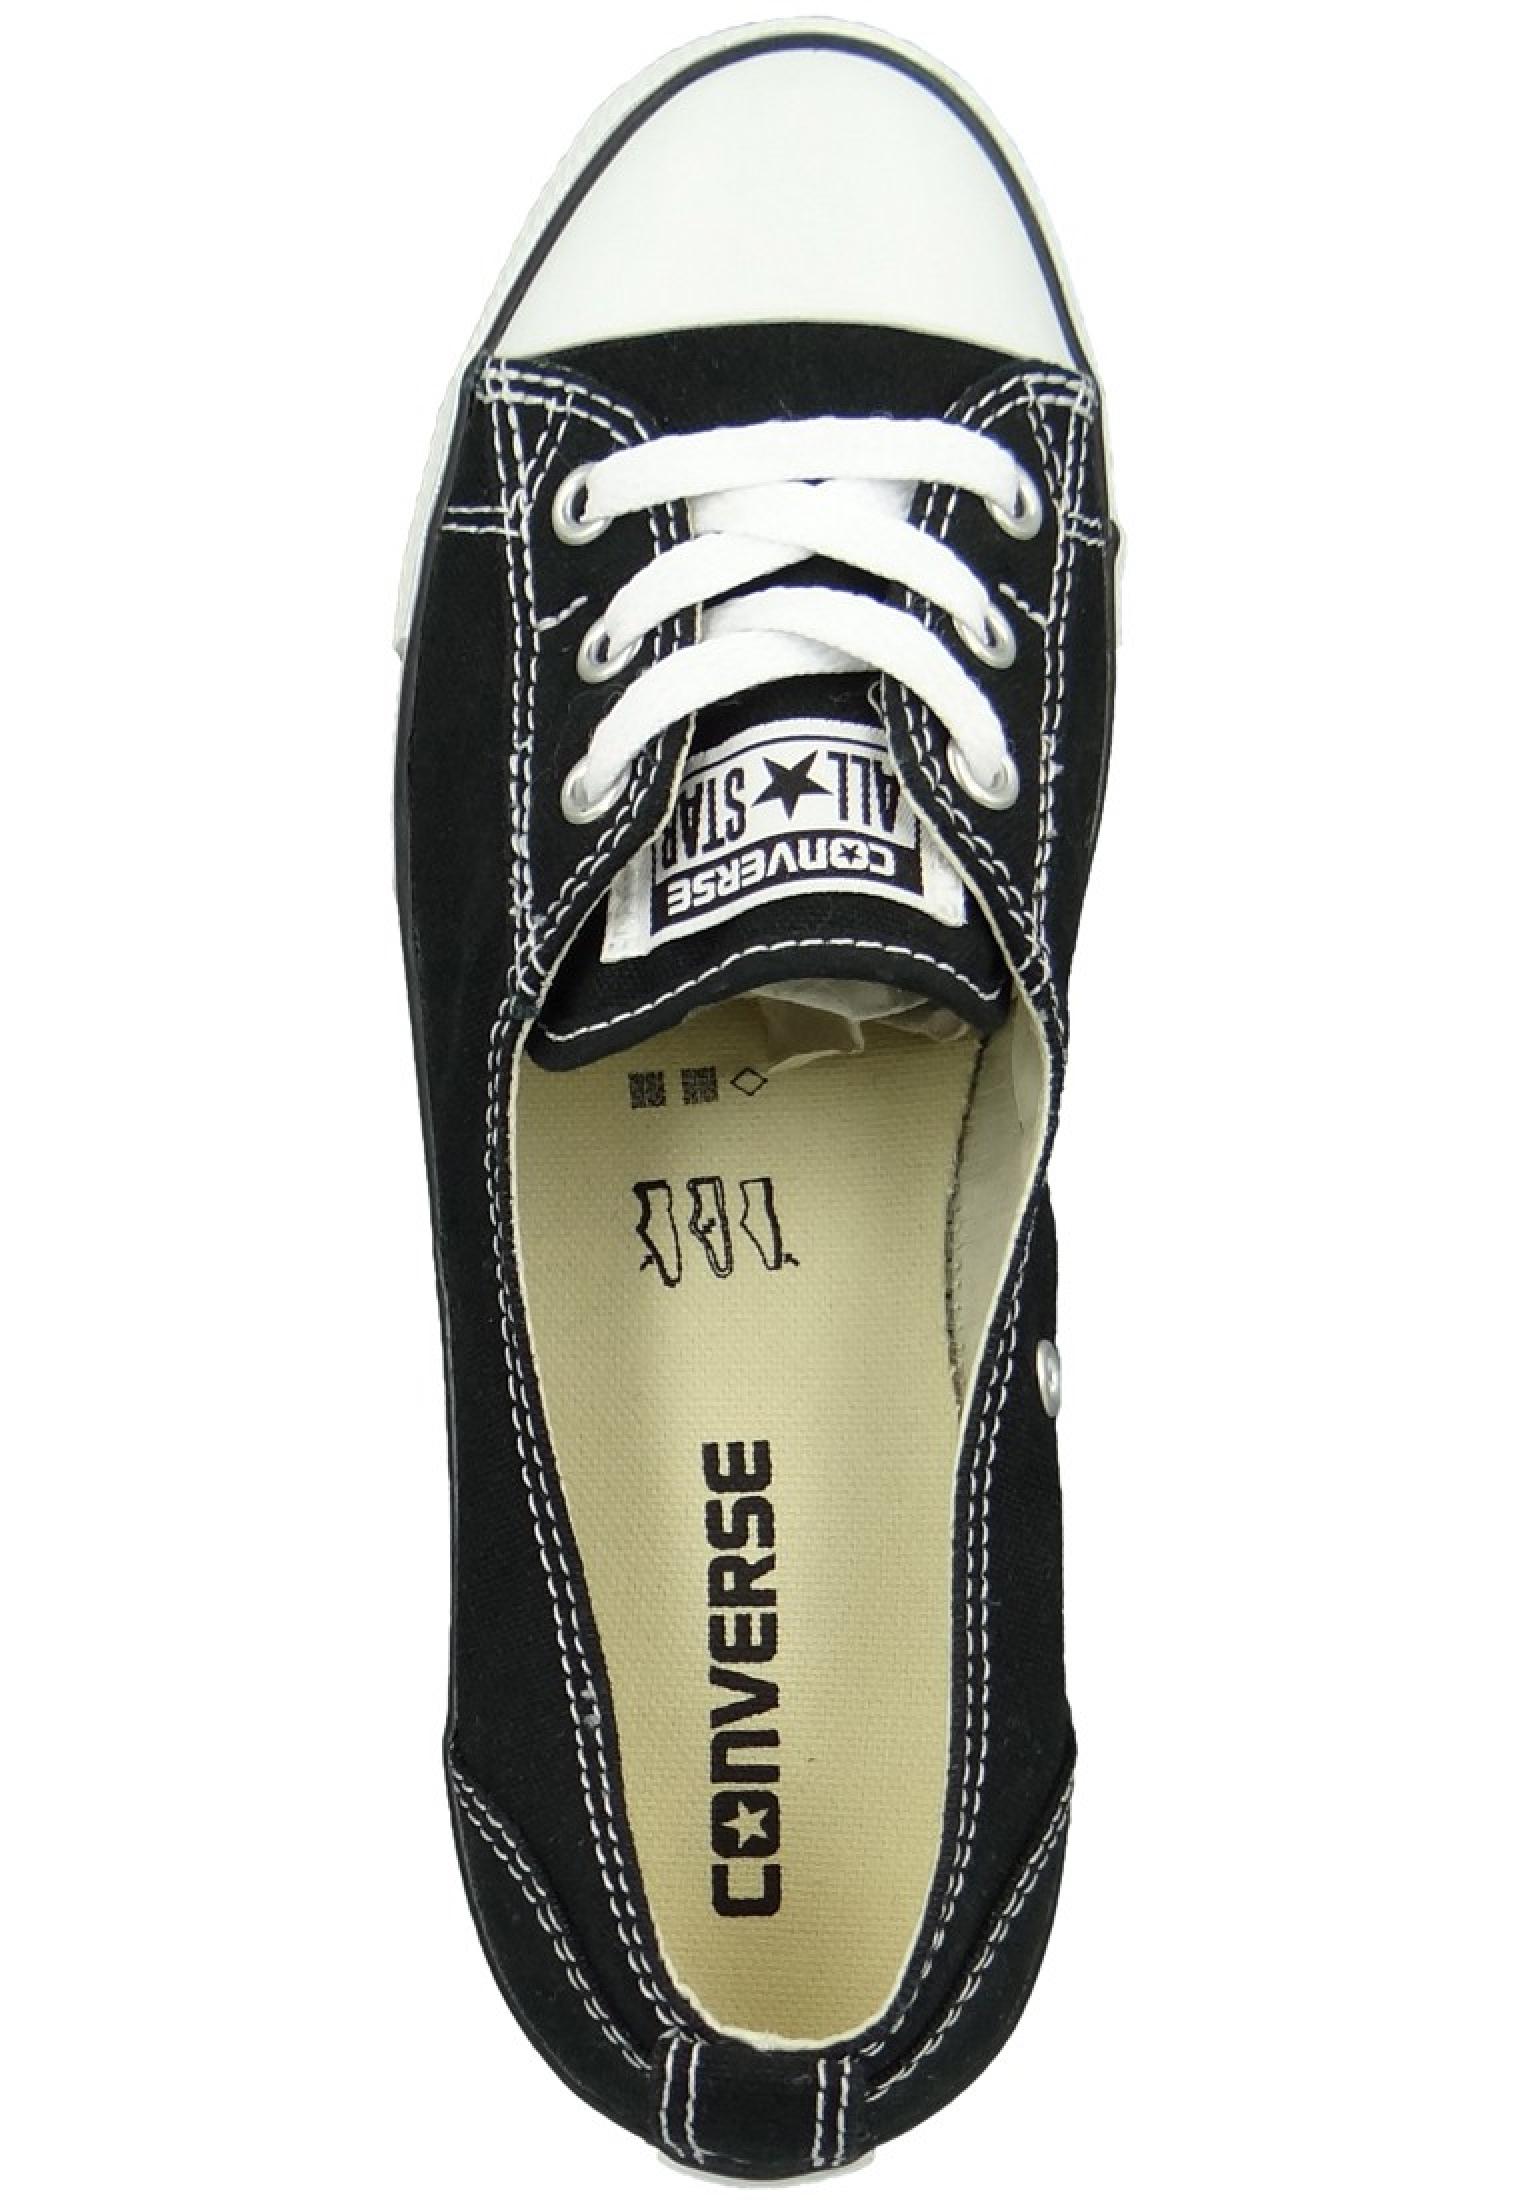 Converse Schuhe All Star Ballet Lace Schwarz 547162C Ballerinas 40,5